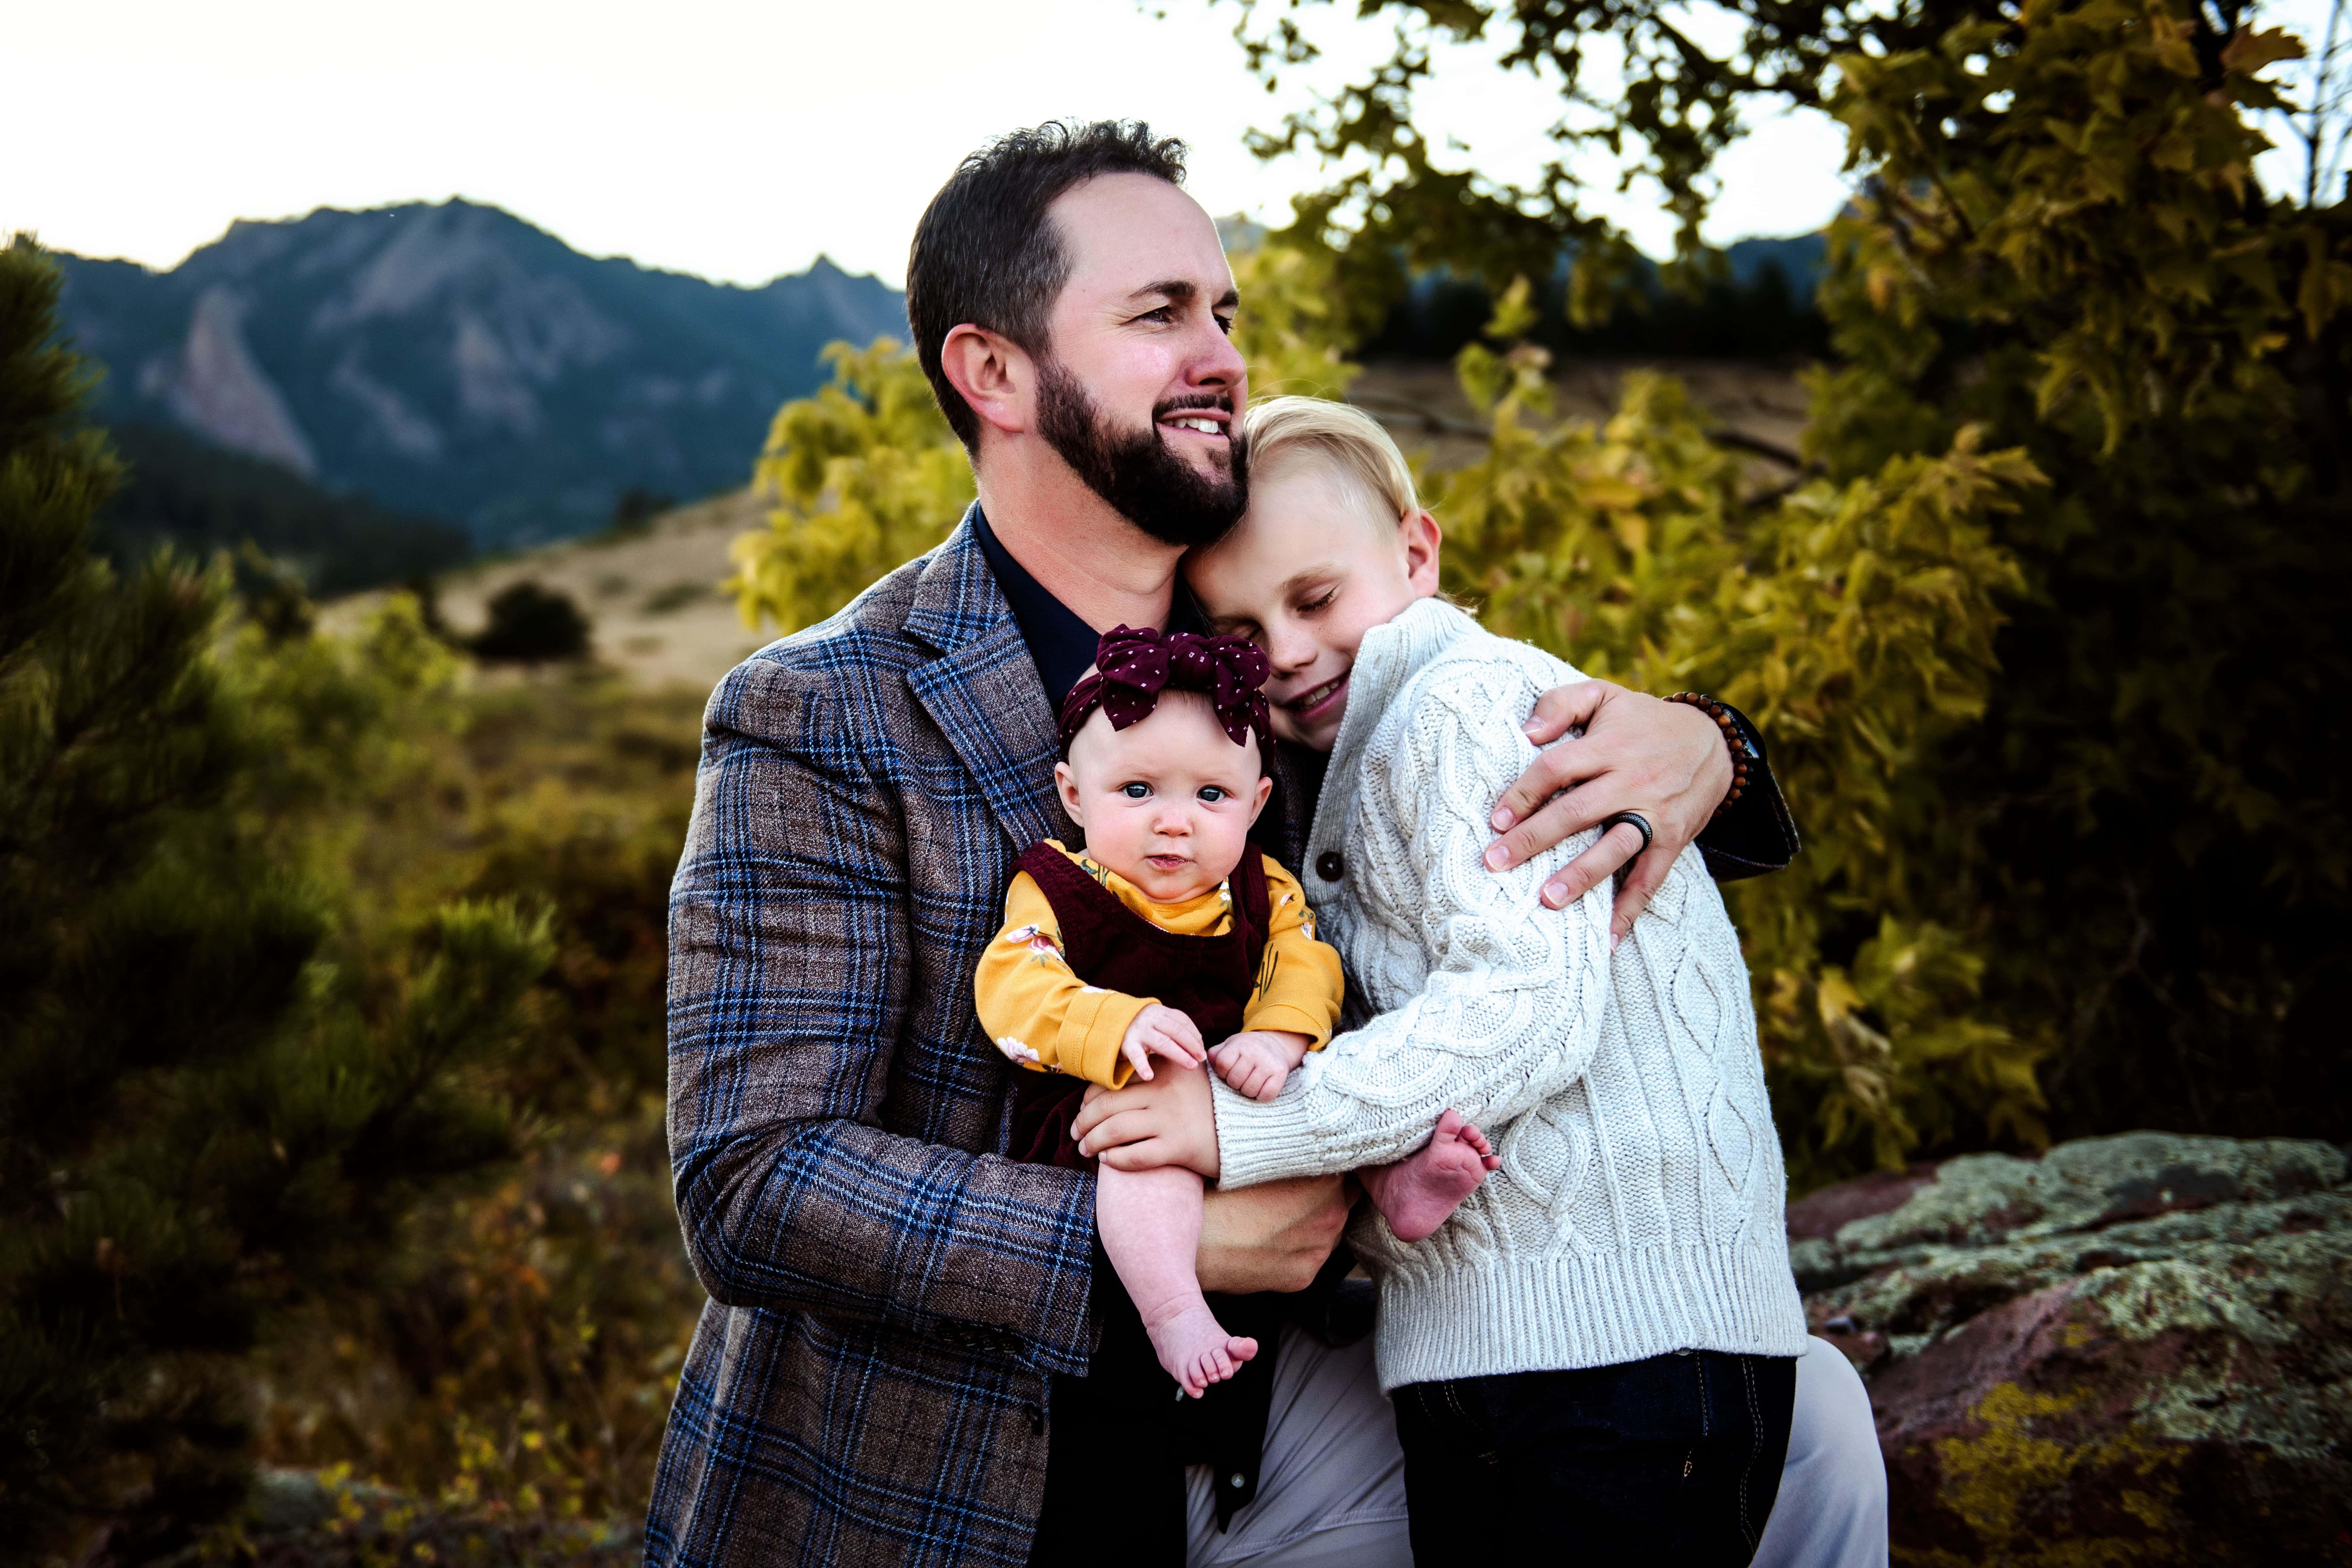 Family photographer, colorado photographer, denver family photos, boulder photographer